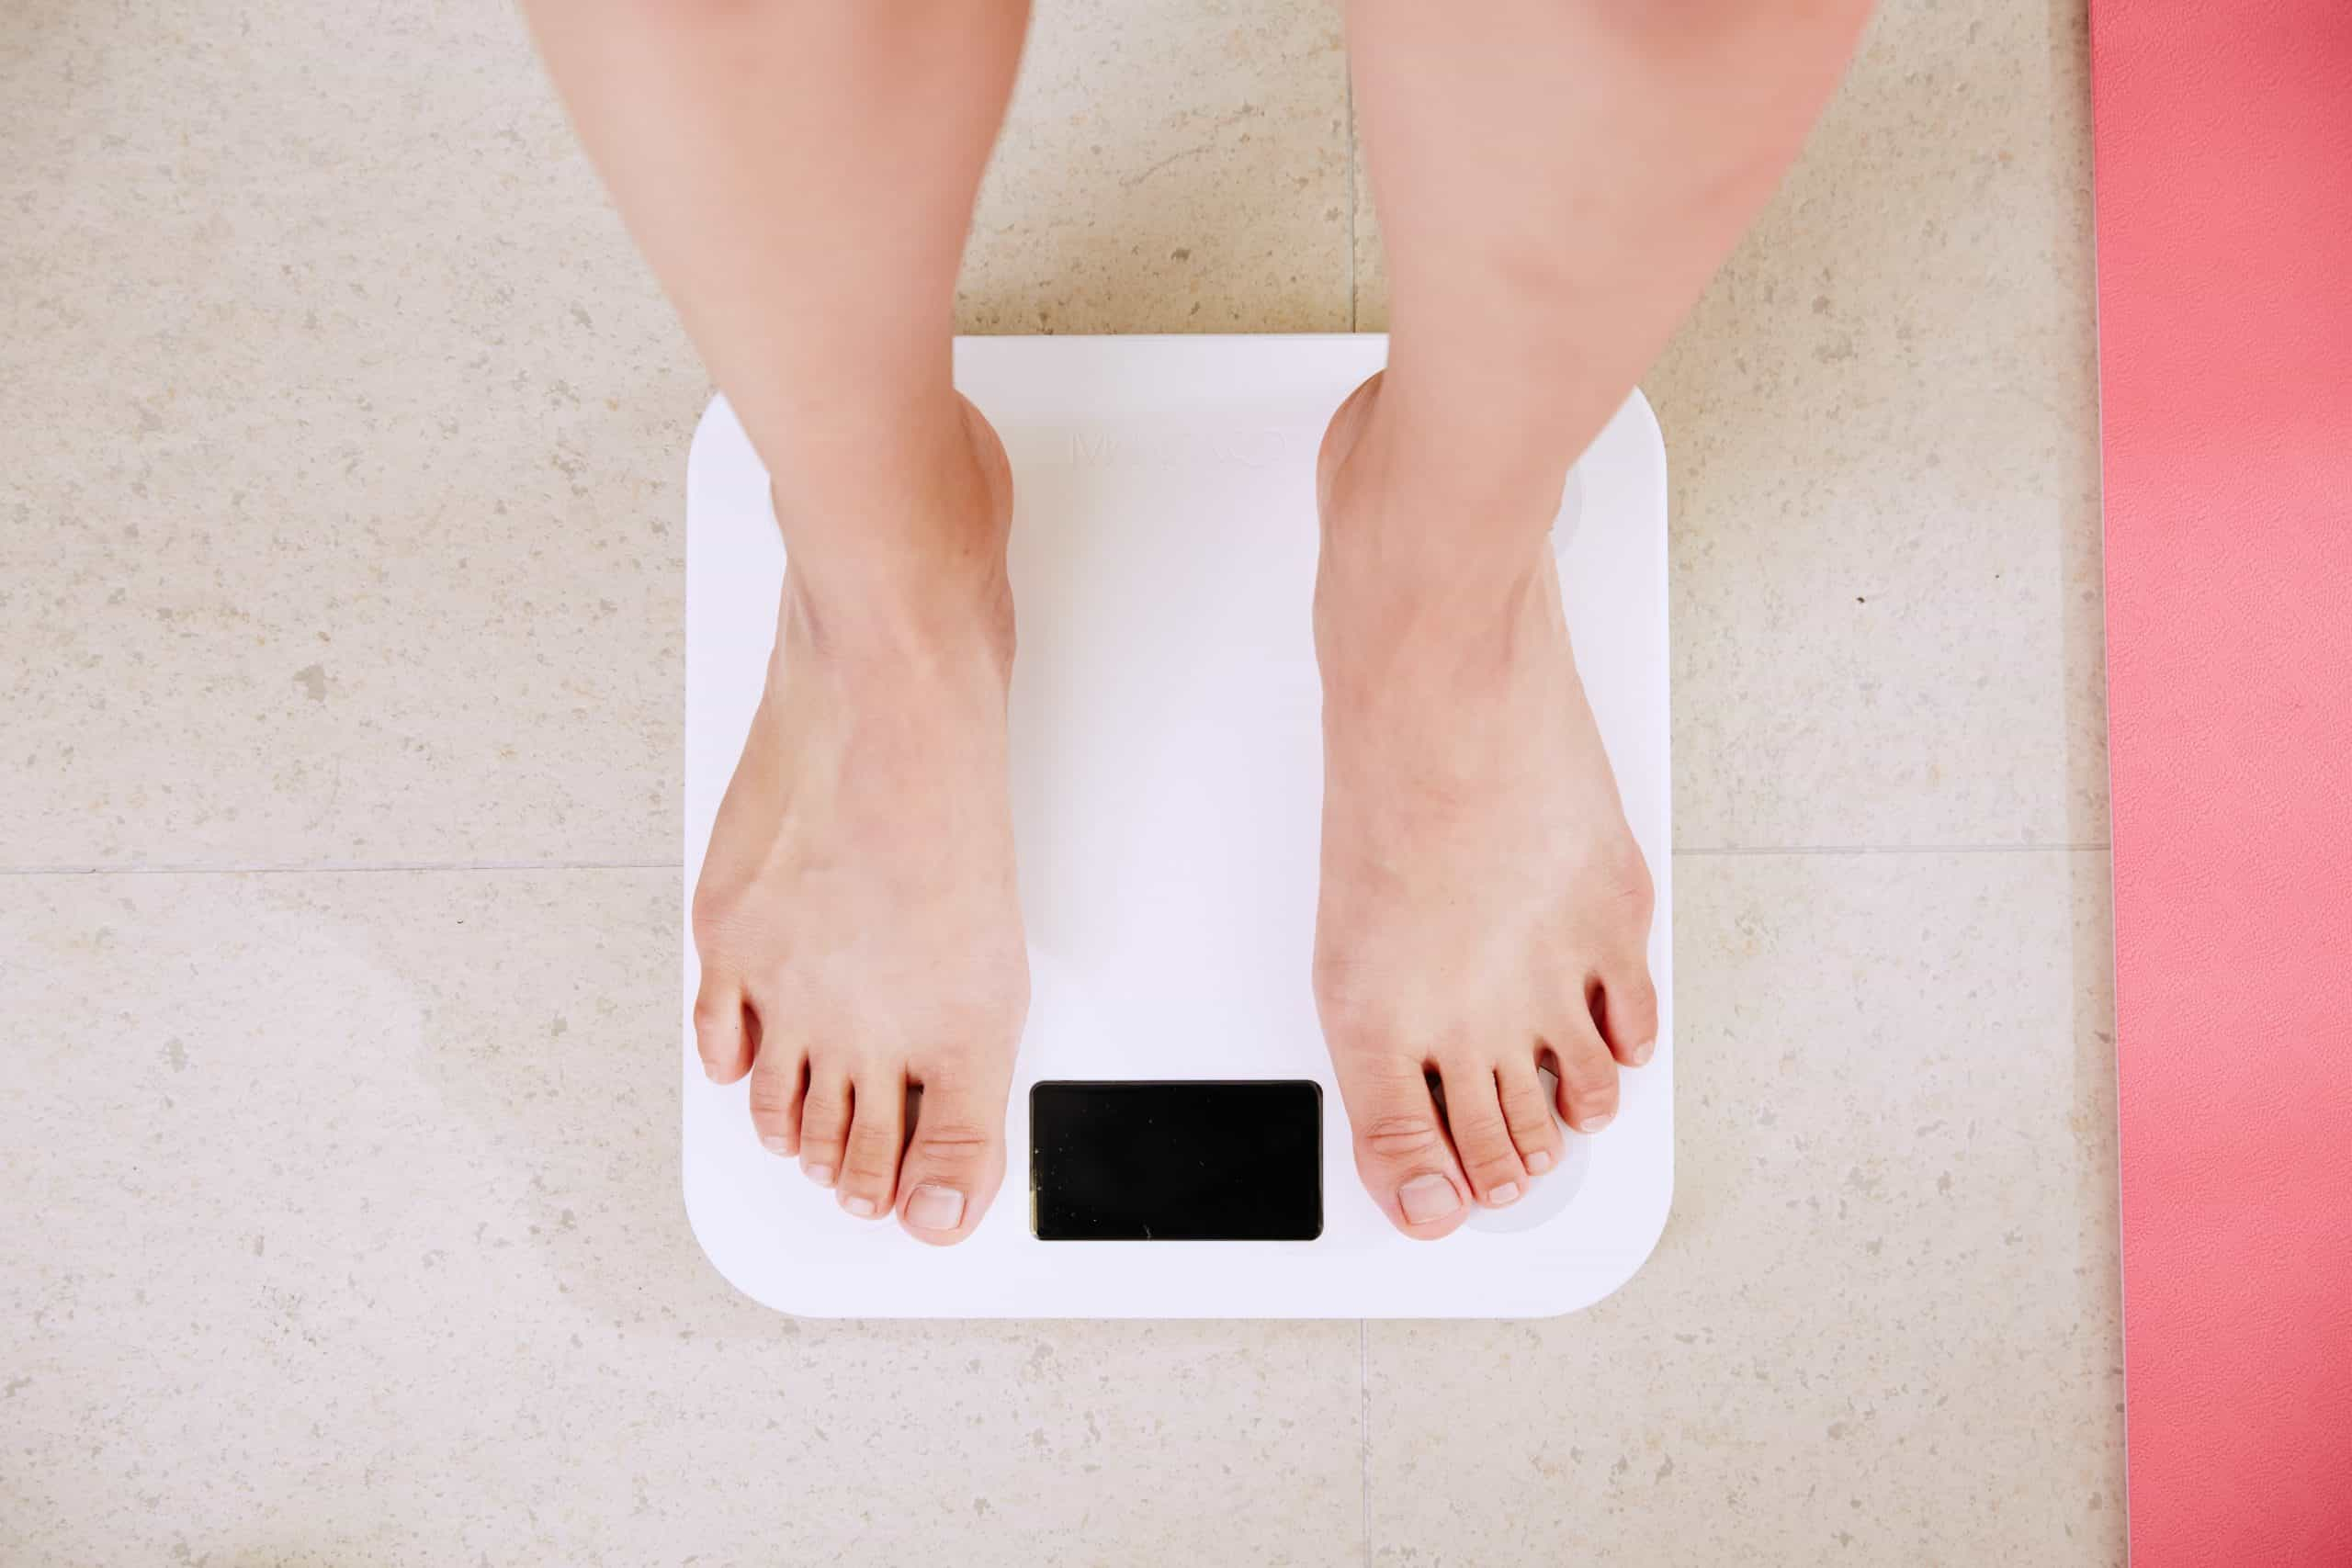 weight gain in diabetics